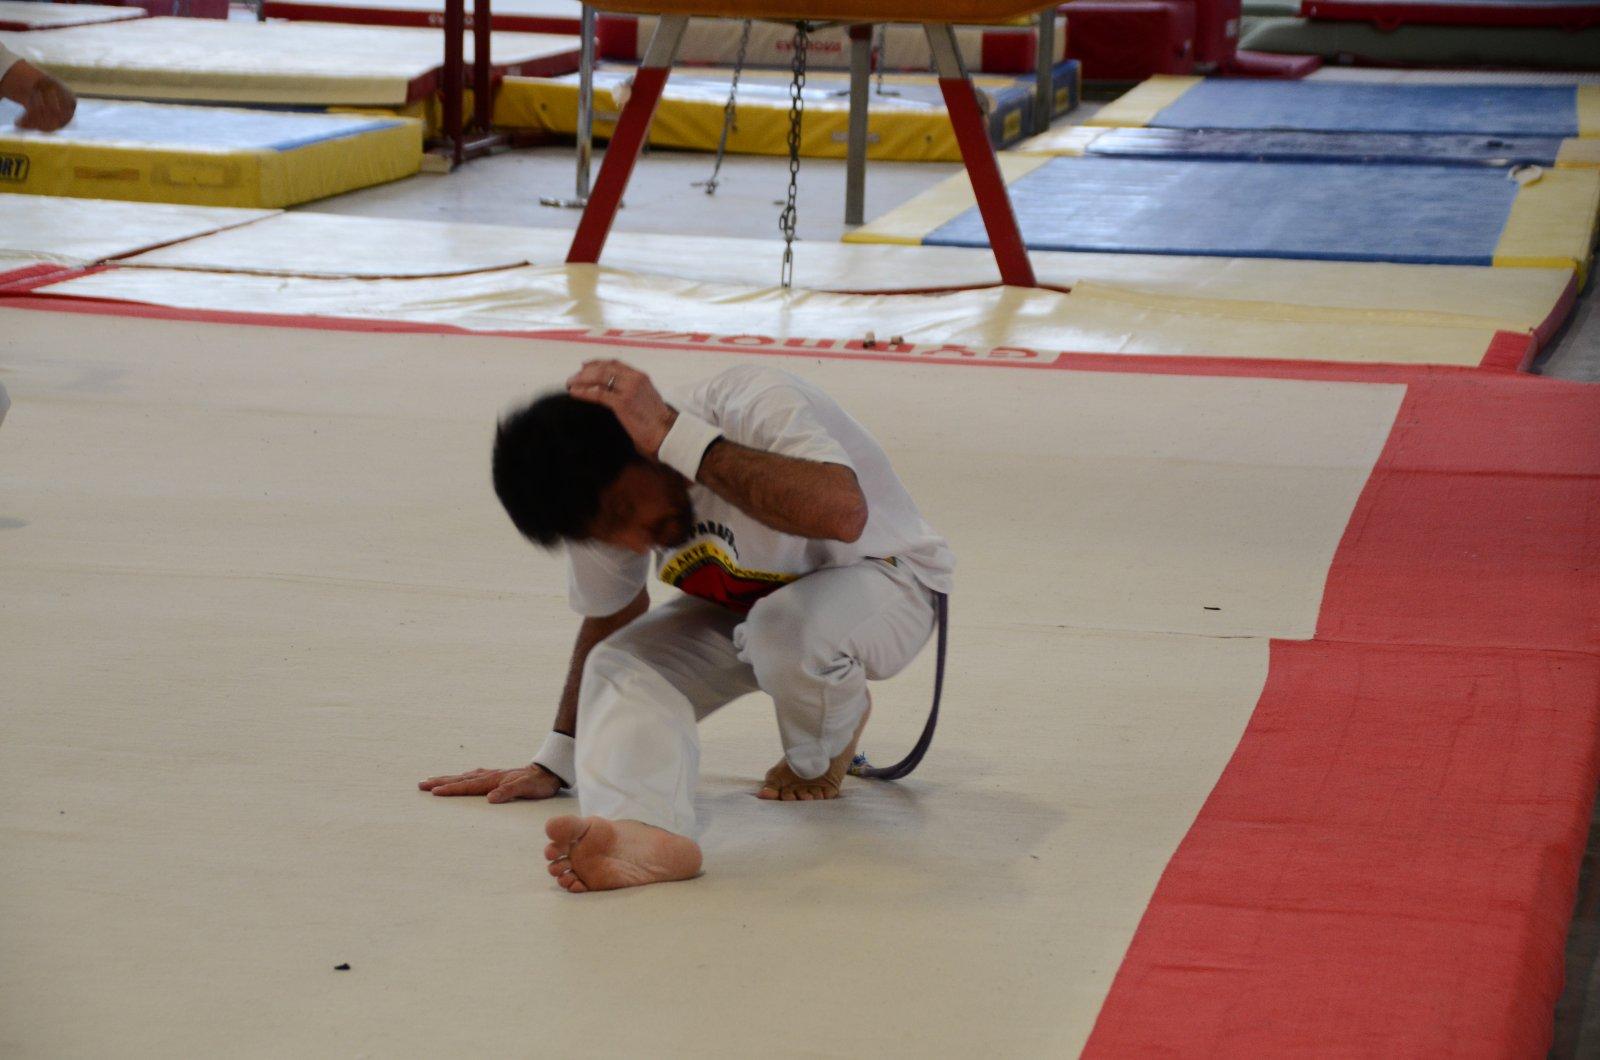 Roda E Galette 2018 Capoeira Nantes (16)